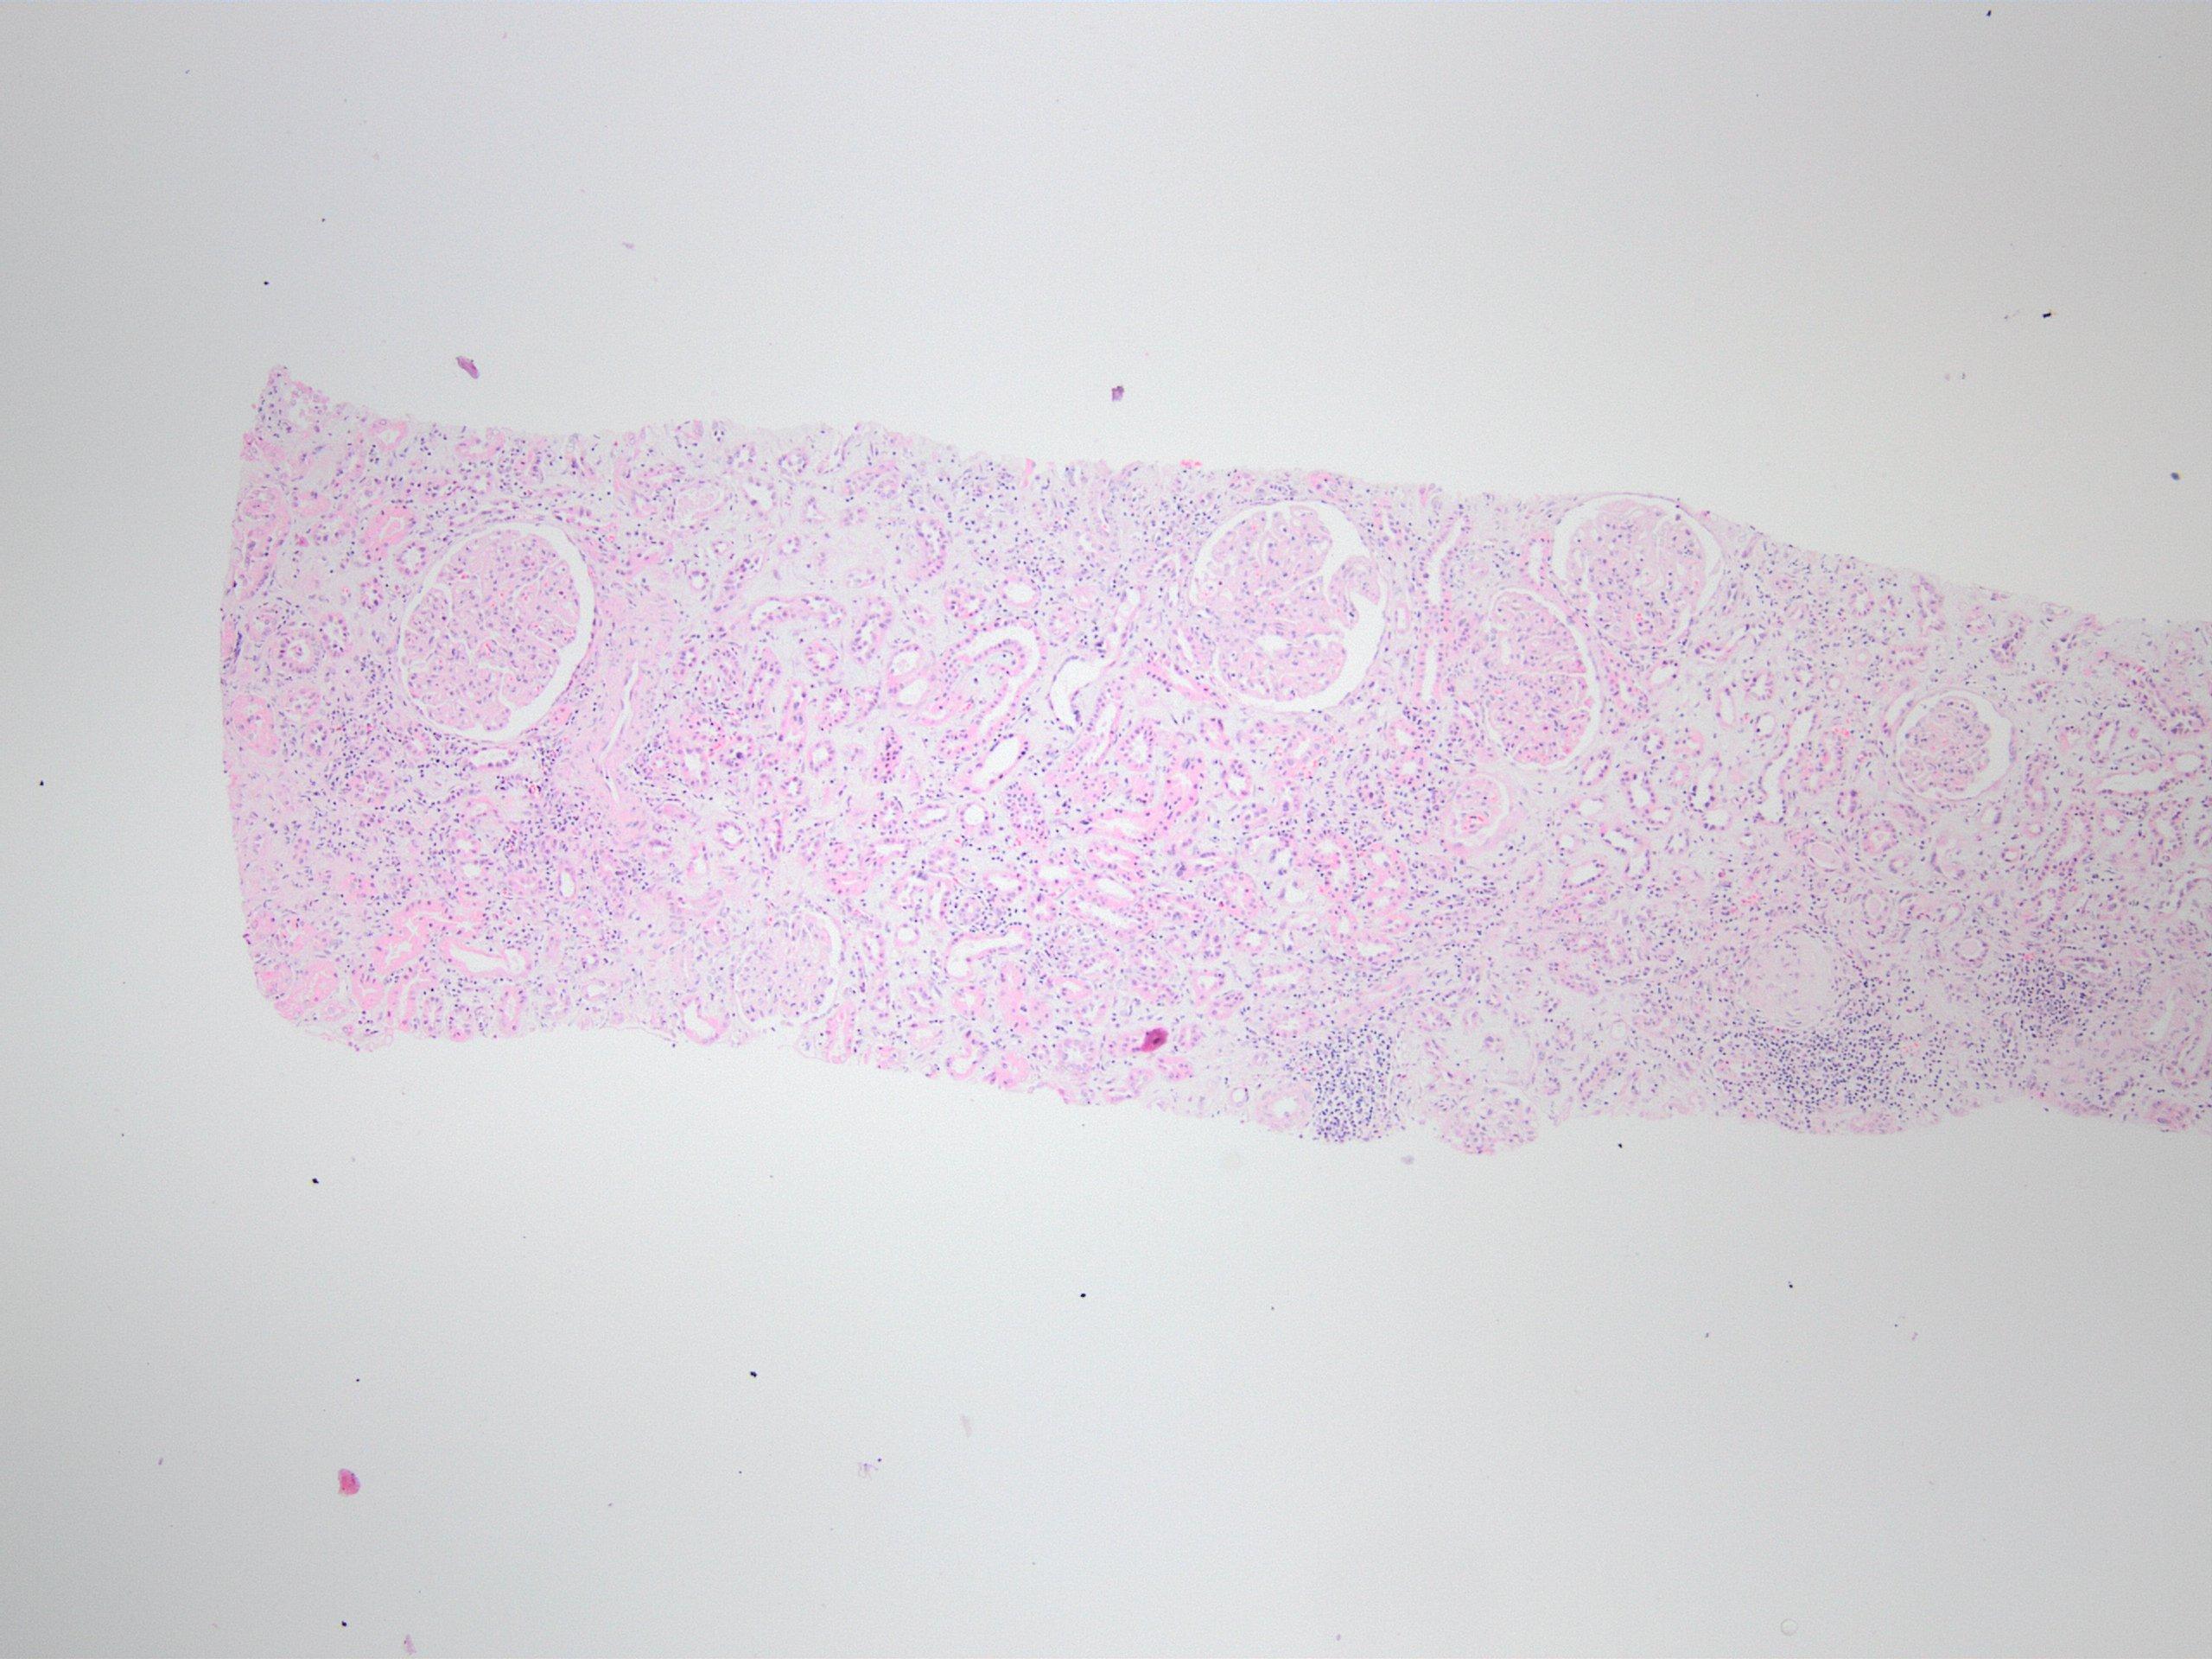 Transplant glomerulopathy